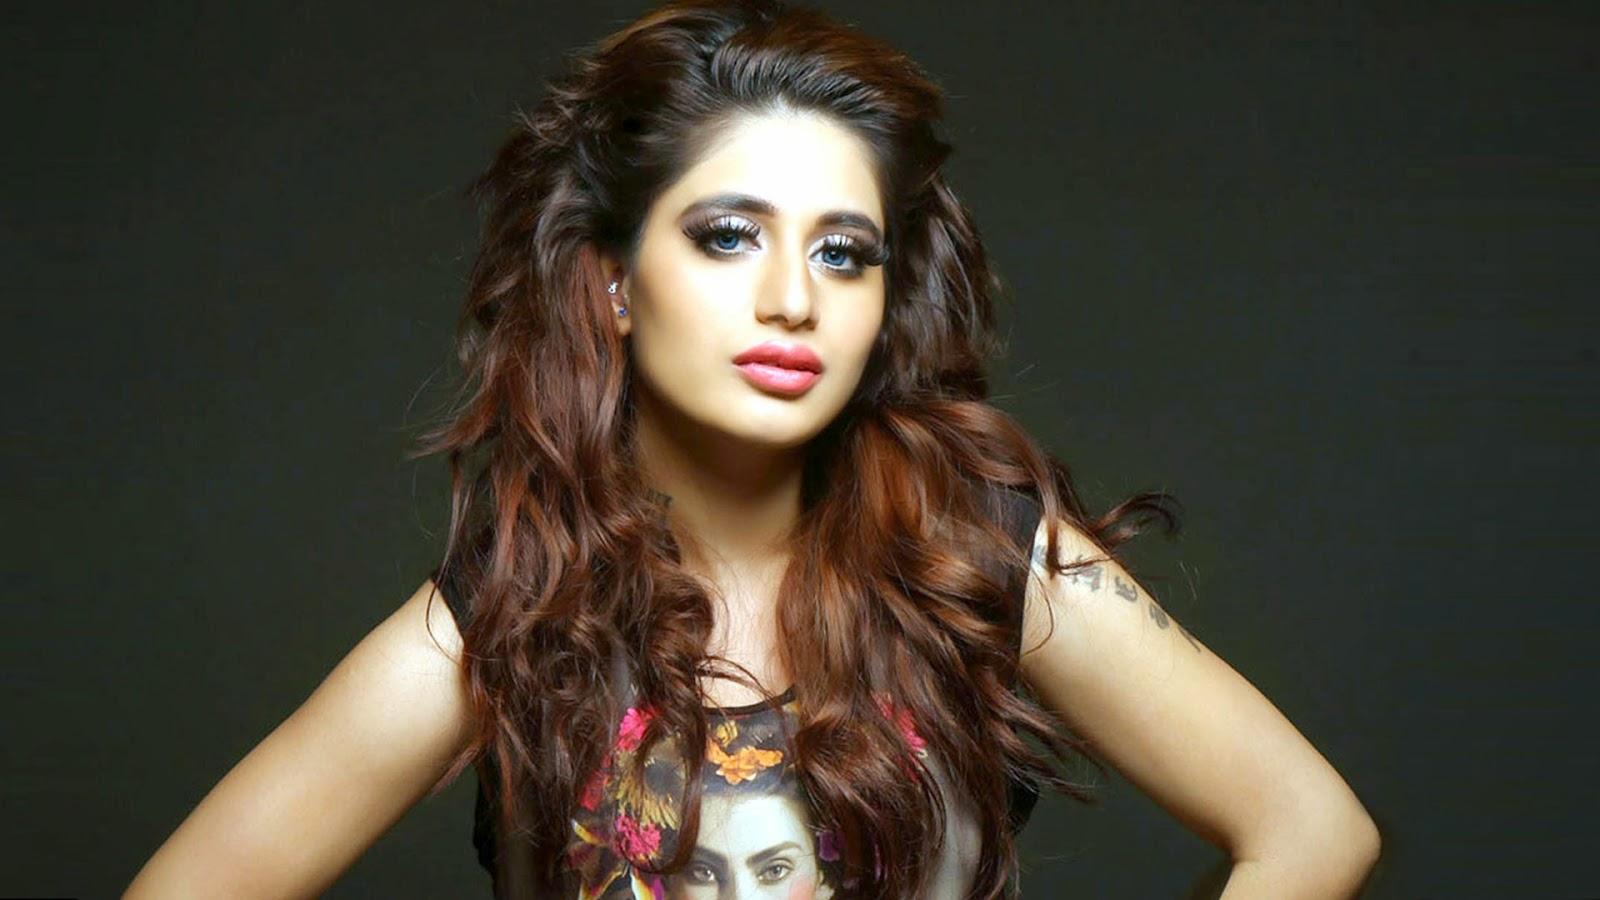 Facebook Covers For Alisa Khan • PoPoPics.com